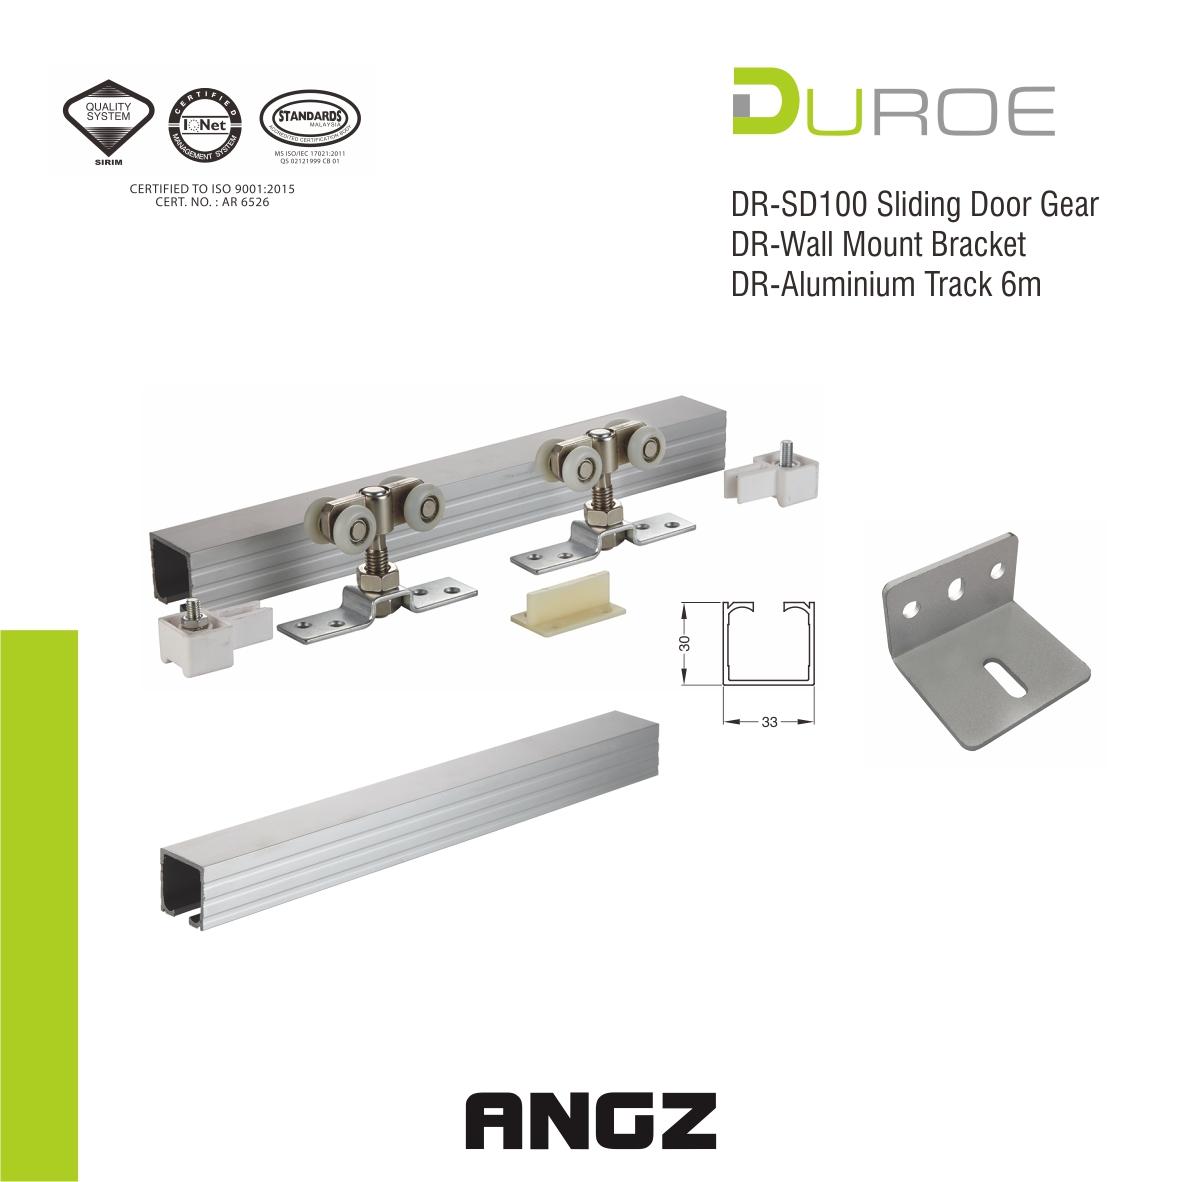 Sliding set DR-SD100 Door Gear